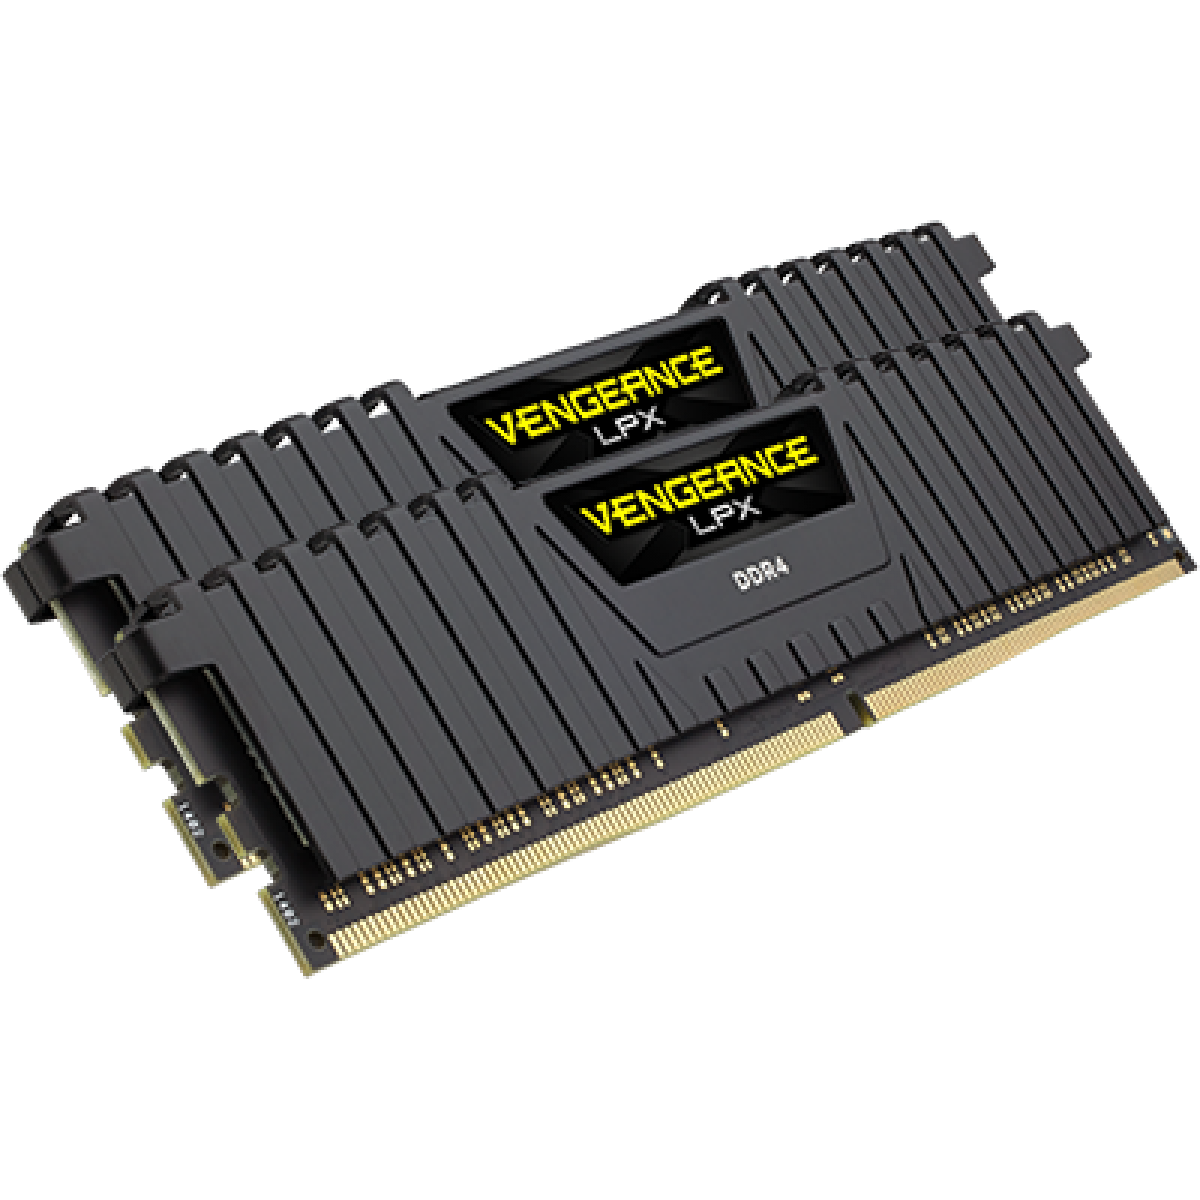 Memória DDR4 Corsair Vengeance LPX, 16GB (2x8GB) 3200MHz, CMK16GX4M2B3200C16